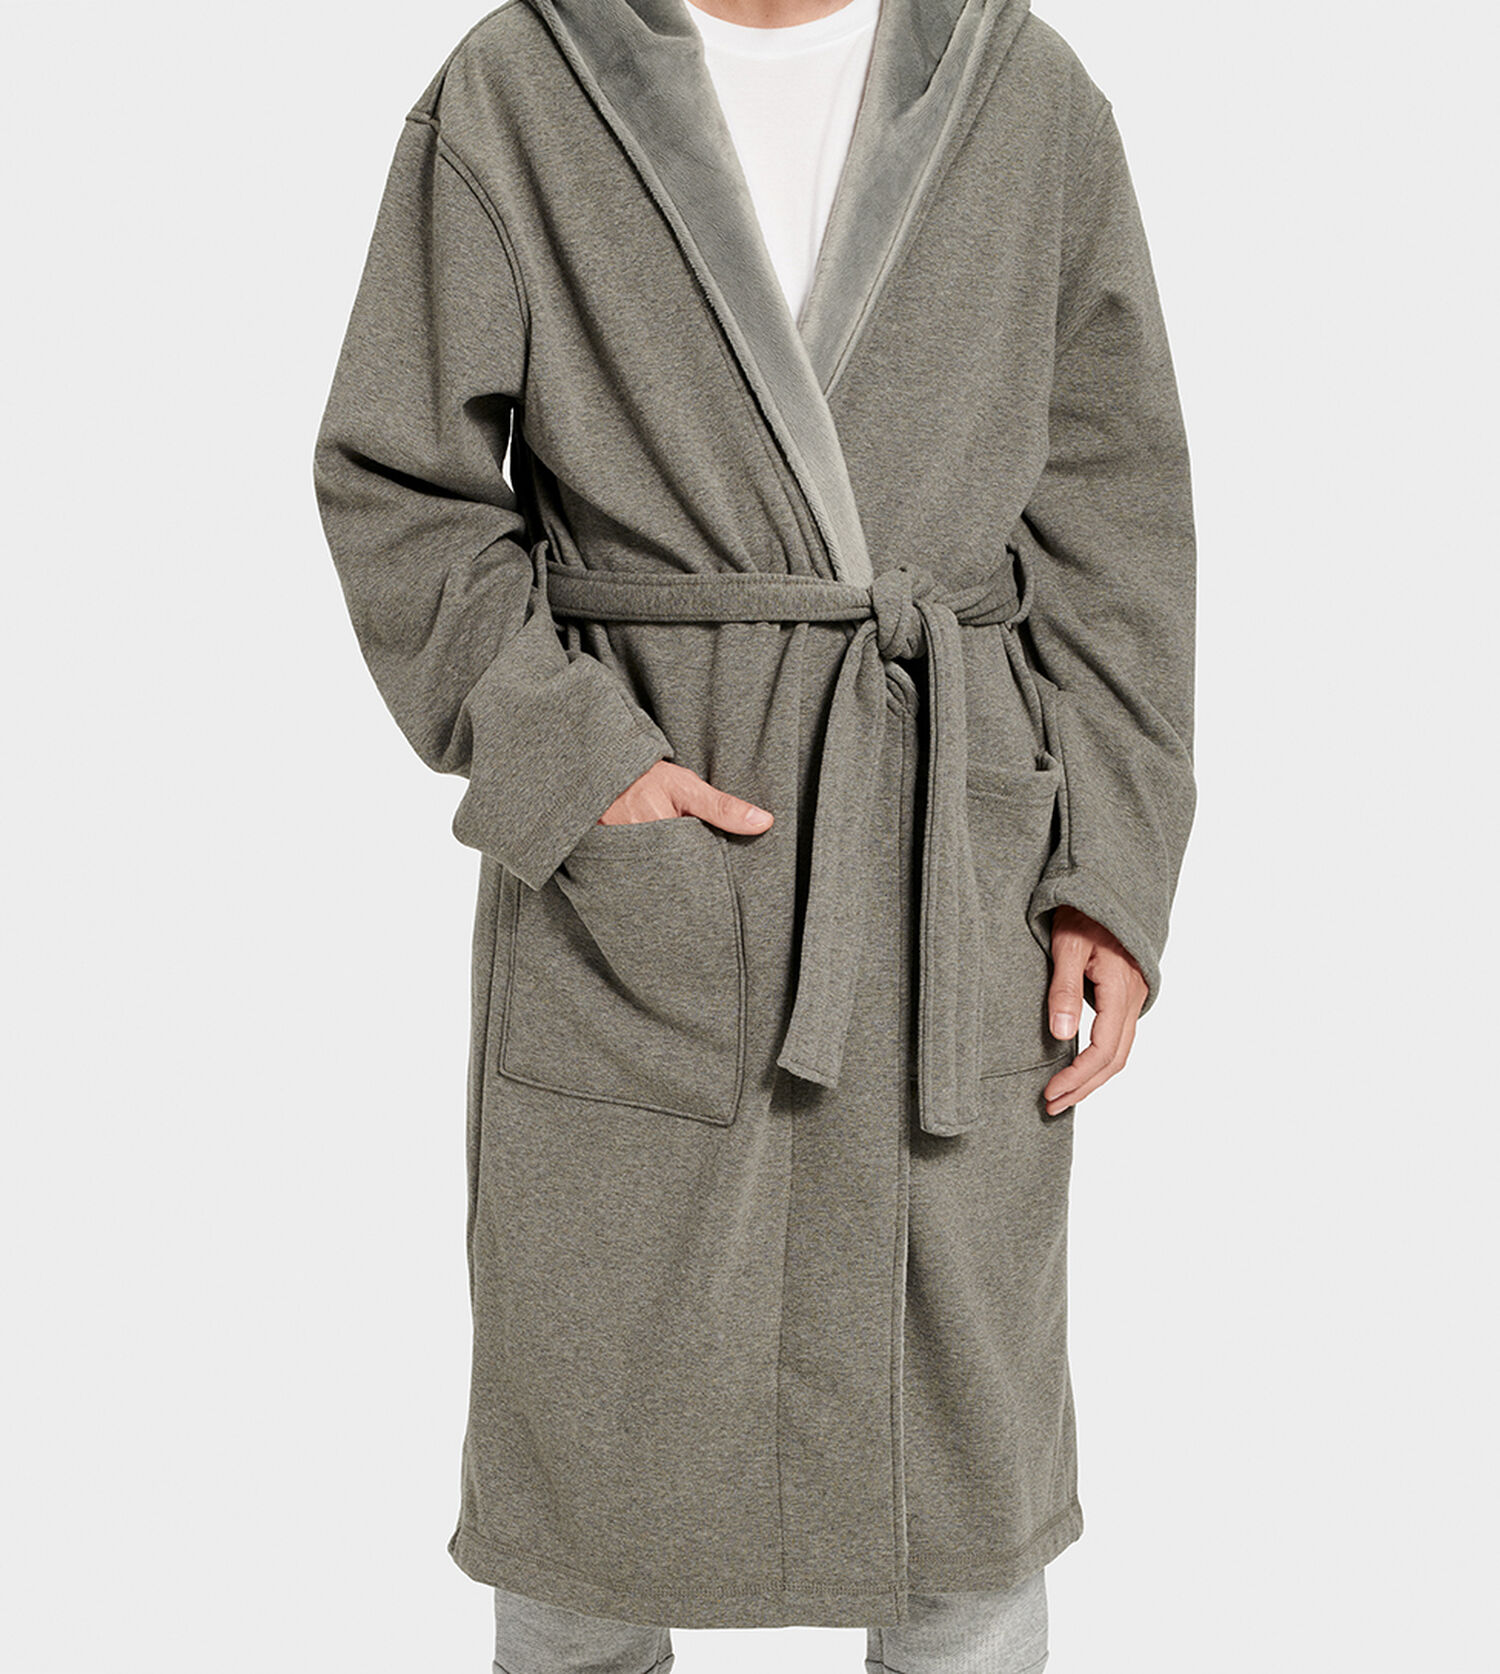 b2aff413c7f Men's Share this product Brunswick Robe